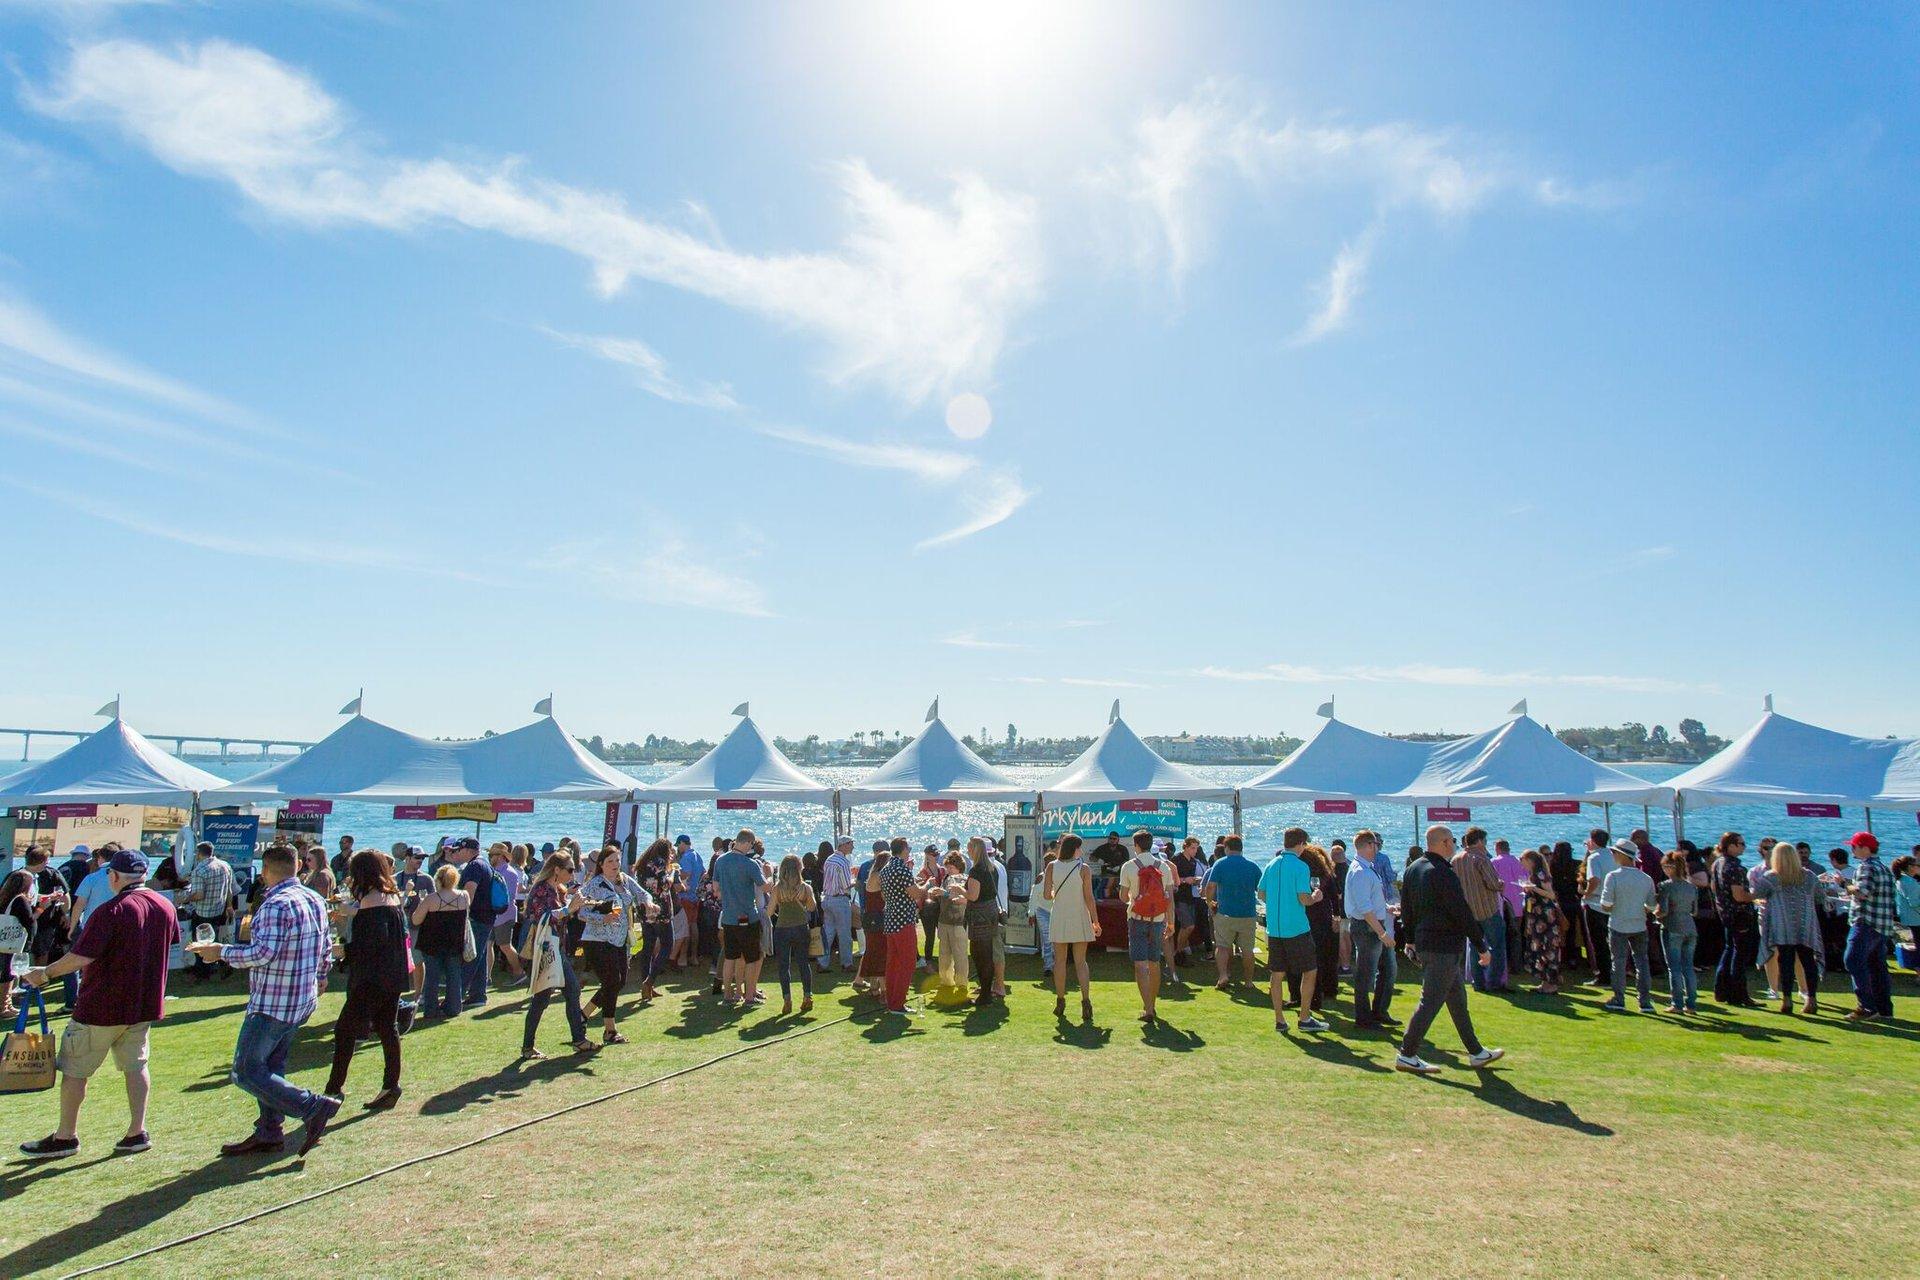 San Diego Bay Wine + Food Festival in San Diego 2019 - Best Time